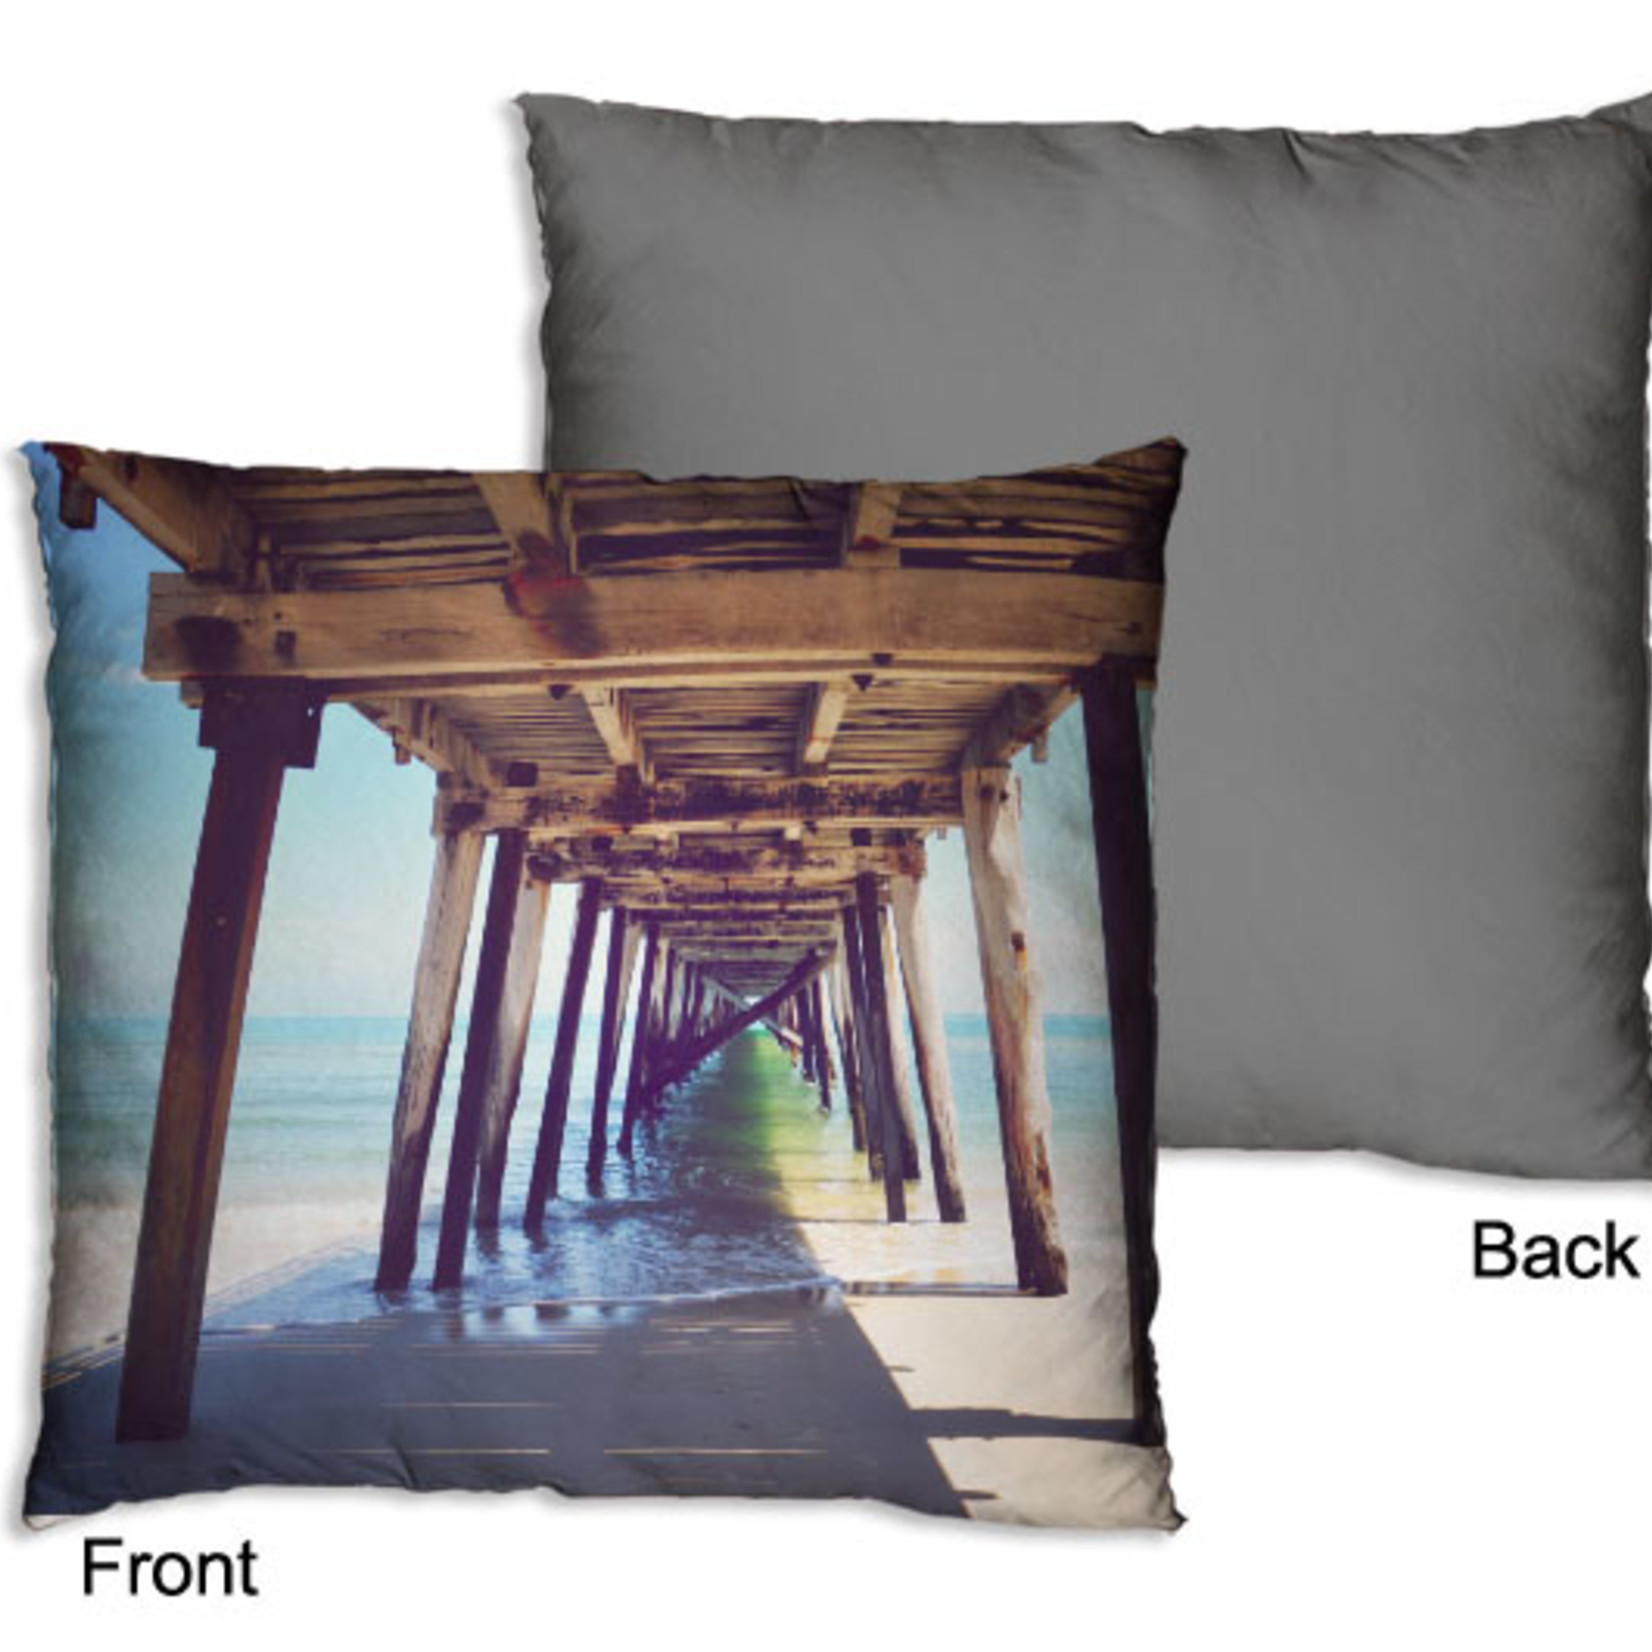 MiCa N1734 Pillow Scaffold